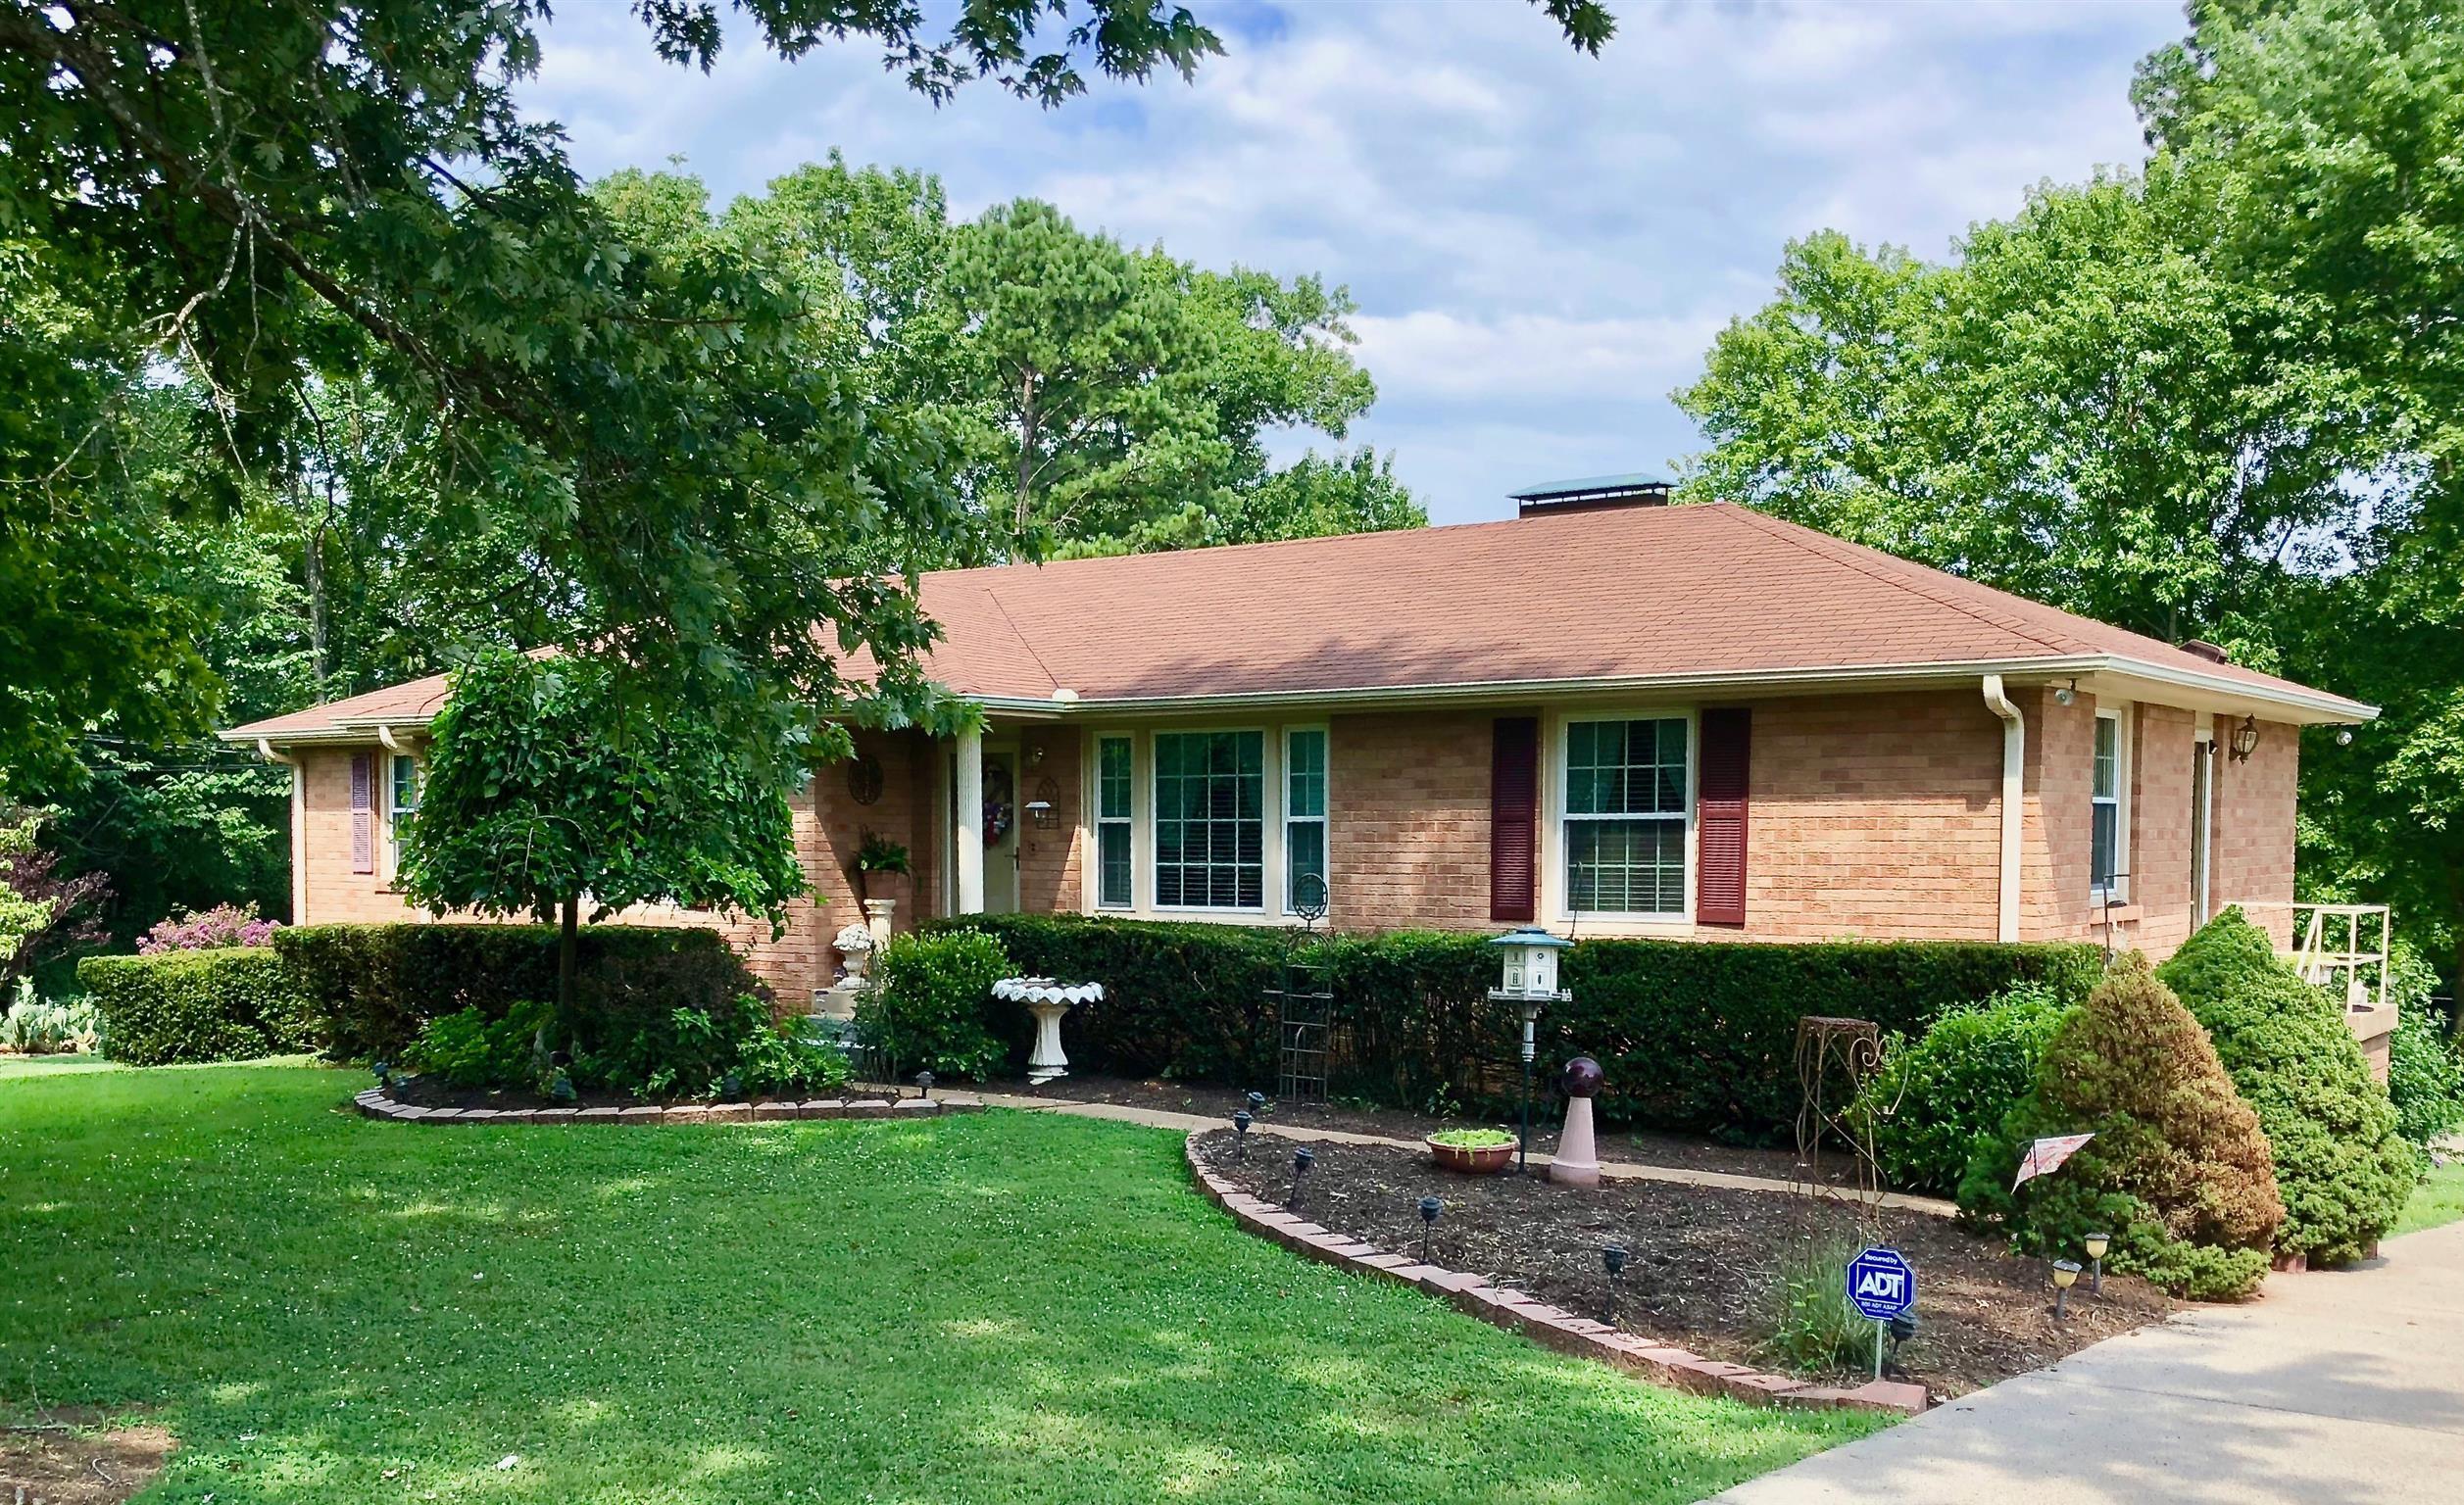 882 Rodney Dr, Nashville, TN 37205